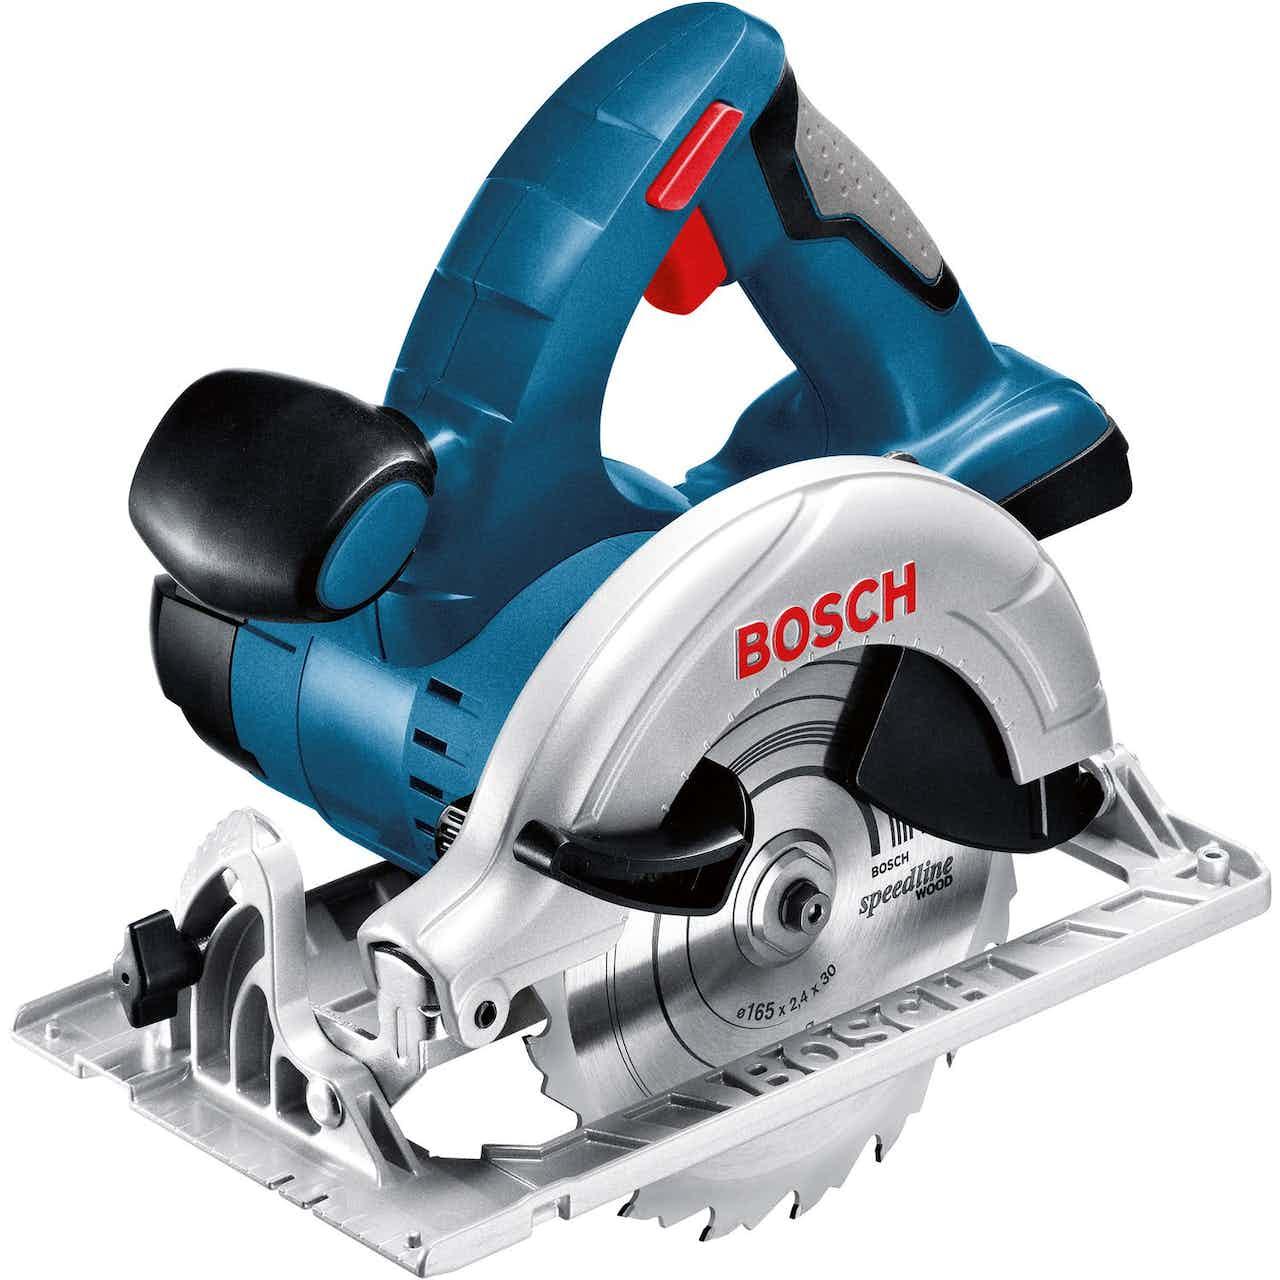 Bosch Professional Akku-Kreissäge GKS 18 V-LI Solo